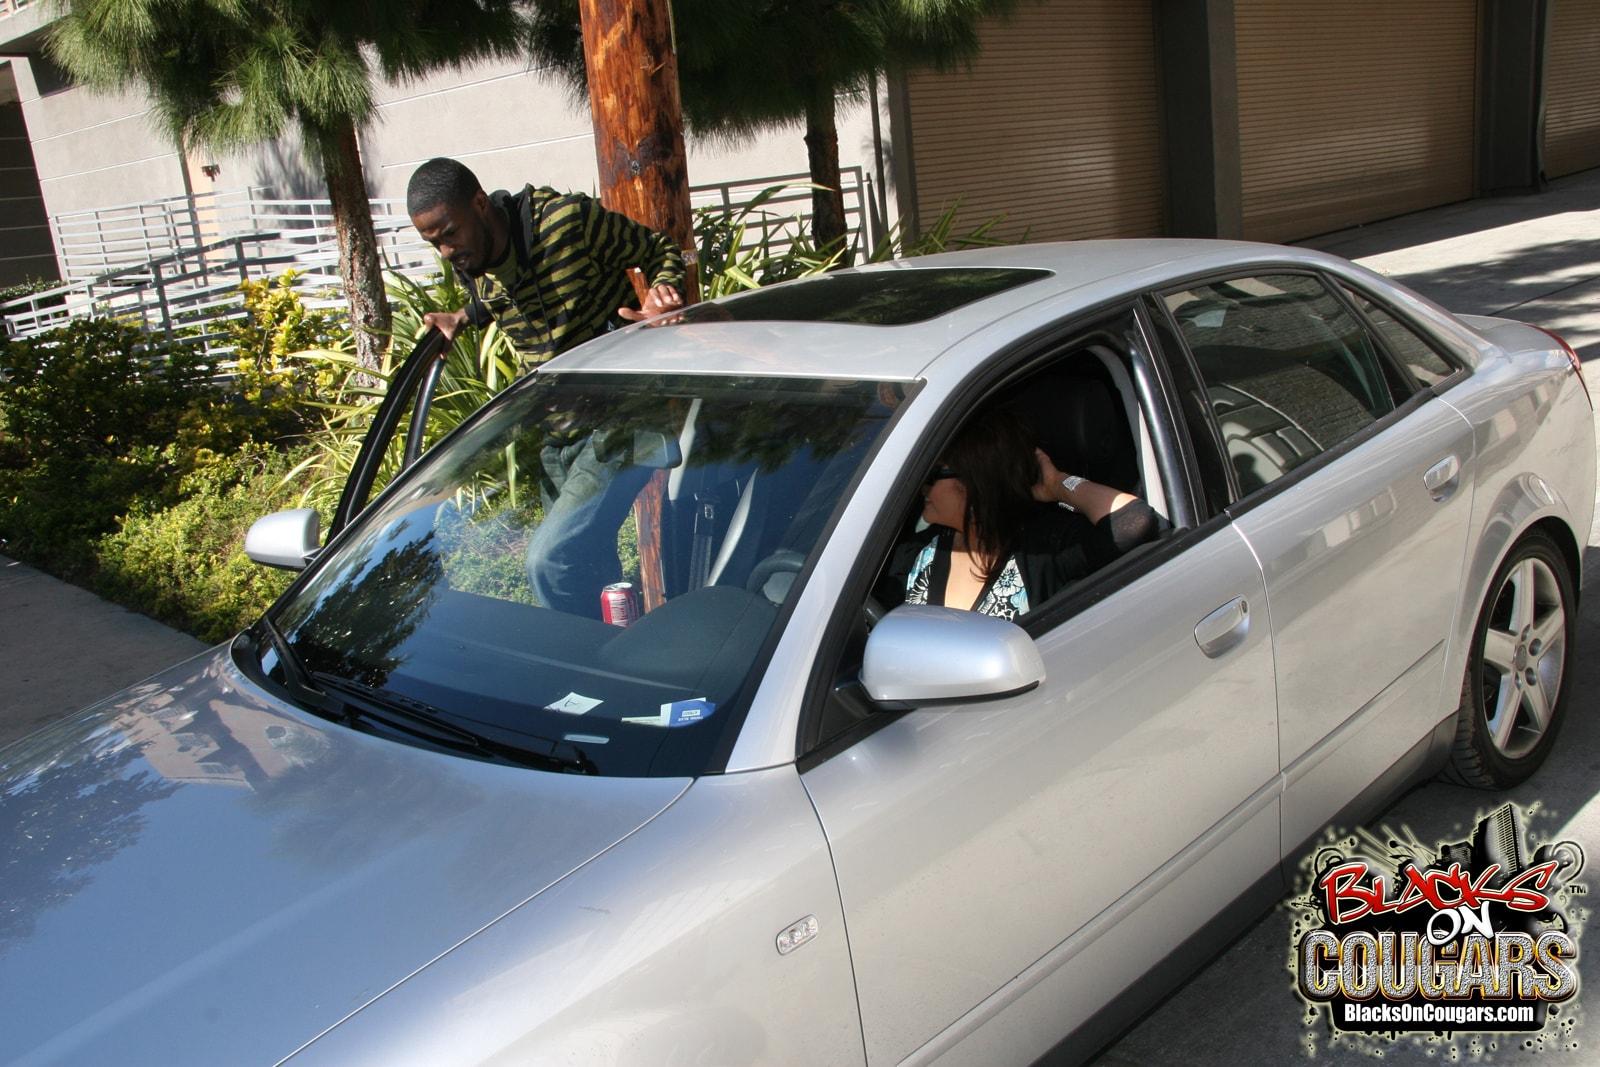 Dogfart '- Blacks On Cougars' starring Bobbi Lennox (Photo 5)